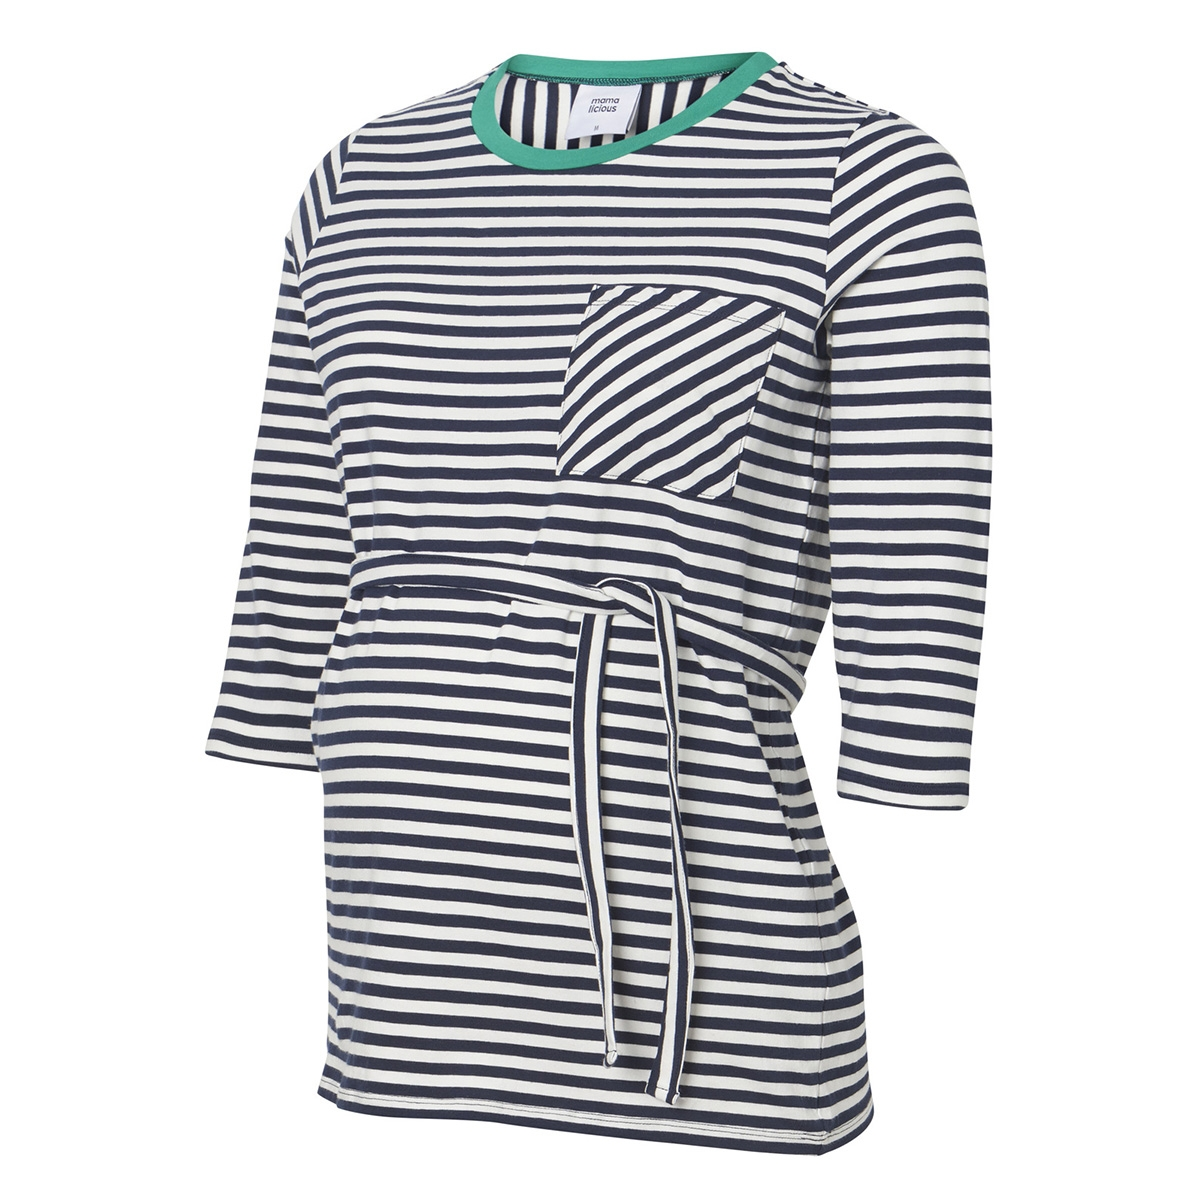 mlgina 3/4 jersey top a. v. 20009535 mama-licious positie shirt navy blazer/y/d stripe